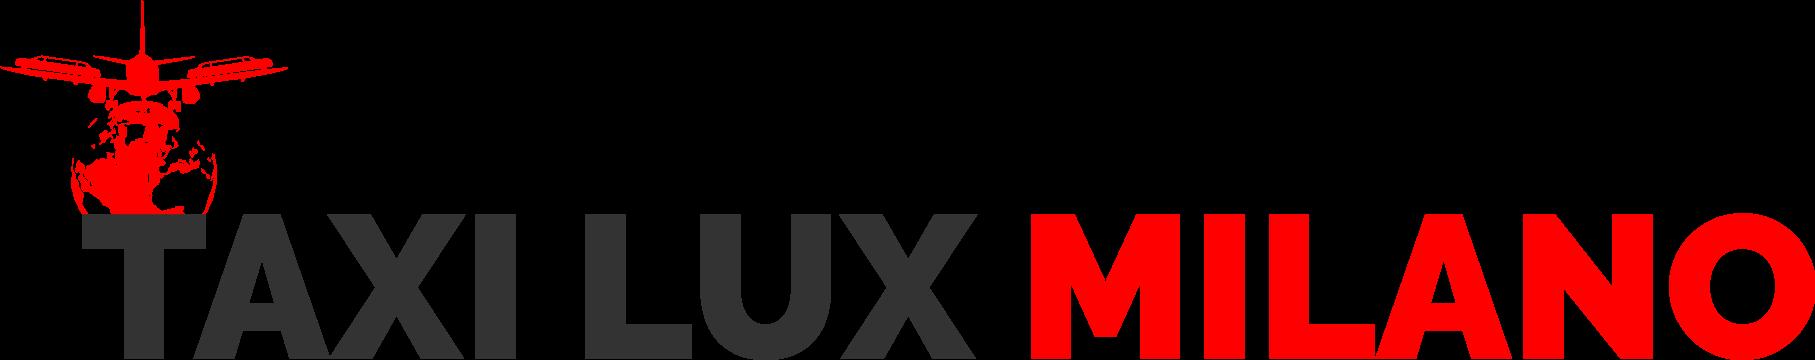 Taxi Lux Milano